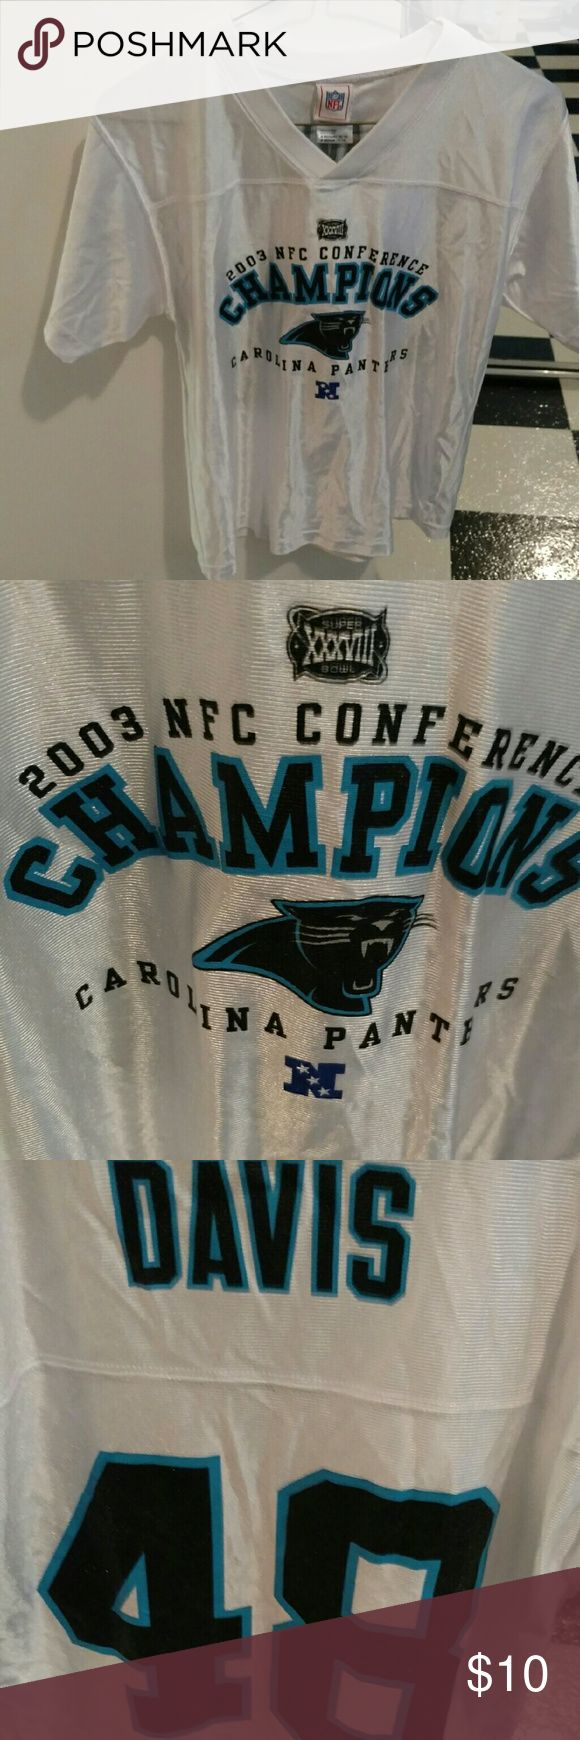 NFL 2003 CAROLINA PANTHERS JERSEY sz M Great condition! NFL Shirts & Tops Sweatshirts & Hoodies